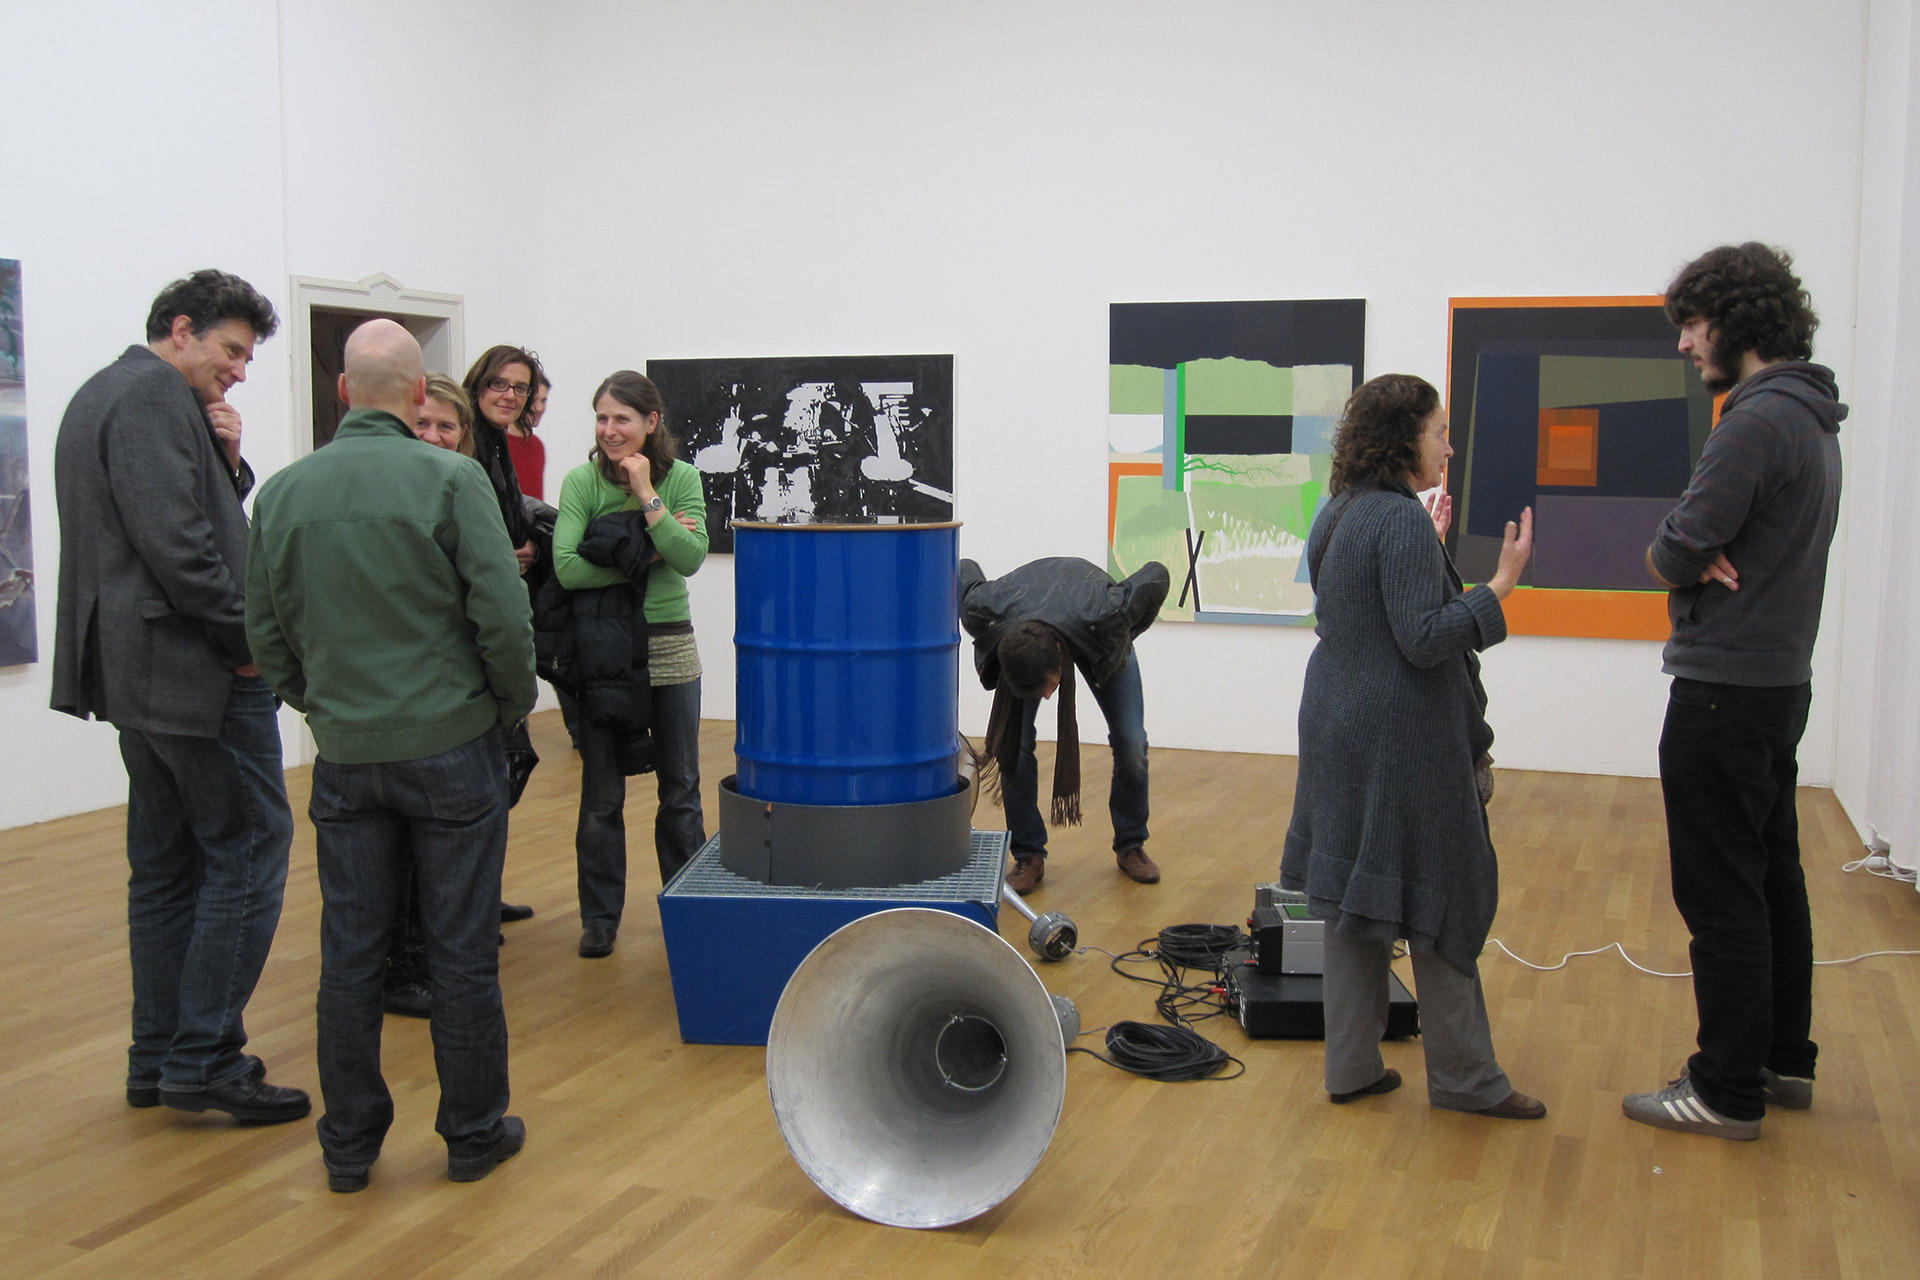 Dezember-Ausstellung-Kunsthalle-Winterthur-2011-1.jpg